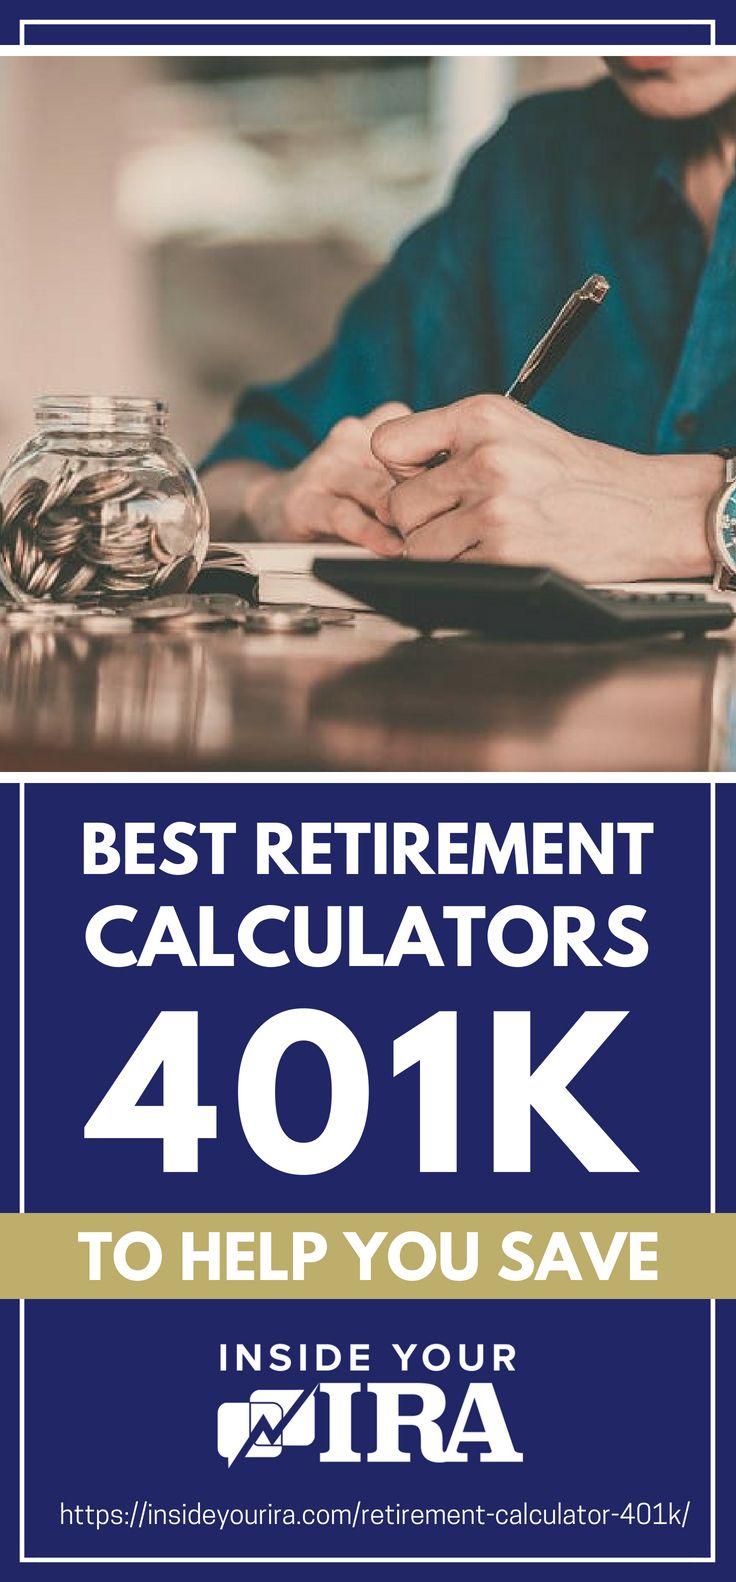 Best Retirement Calculators 401(k) To Help You Save   Inside Your IRA https://insideyourira.com/retirement-calculator-401k/